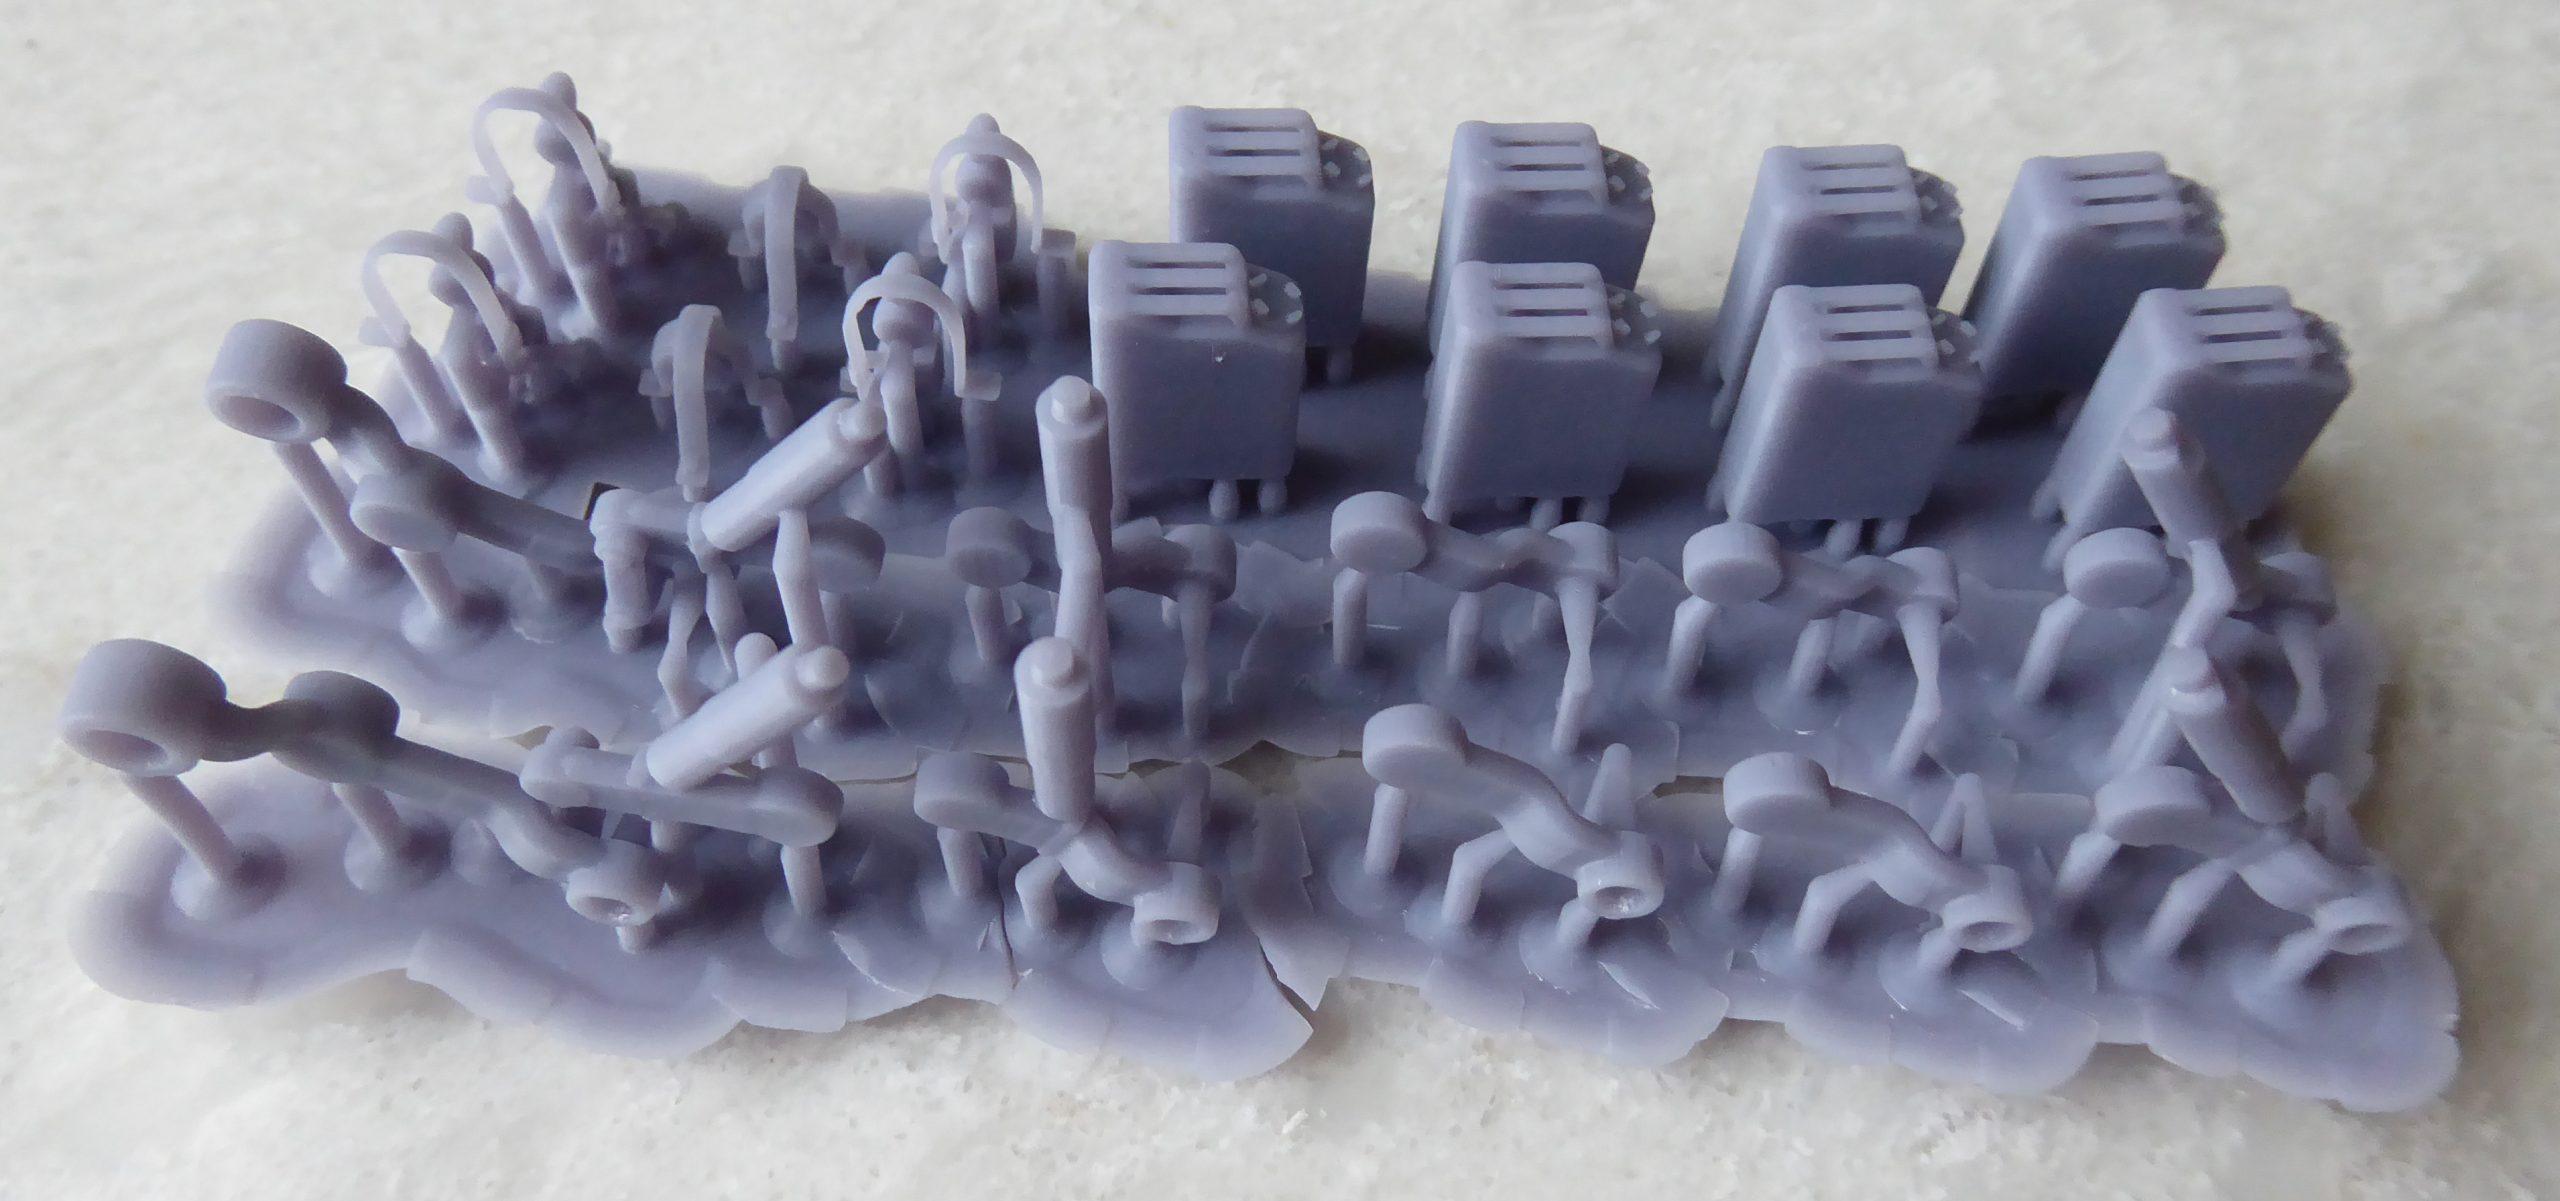 LD-002r printed parts for US Pershing tank